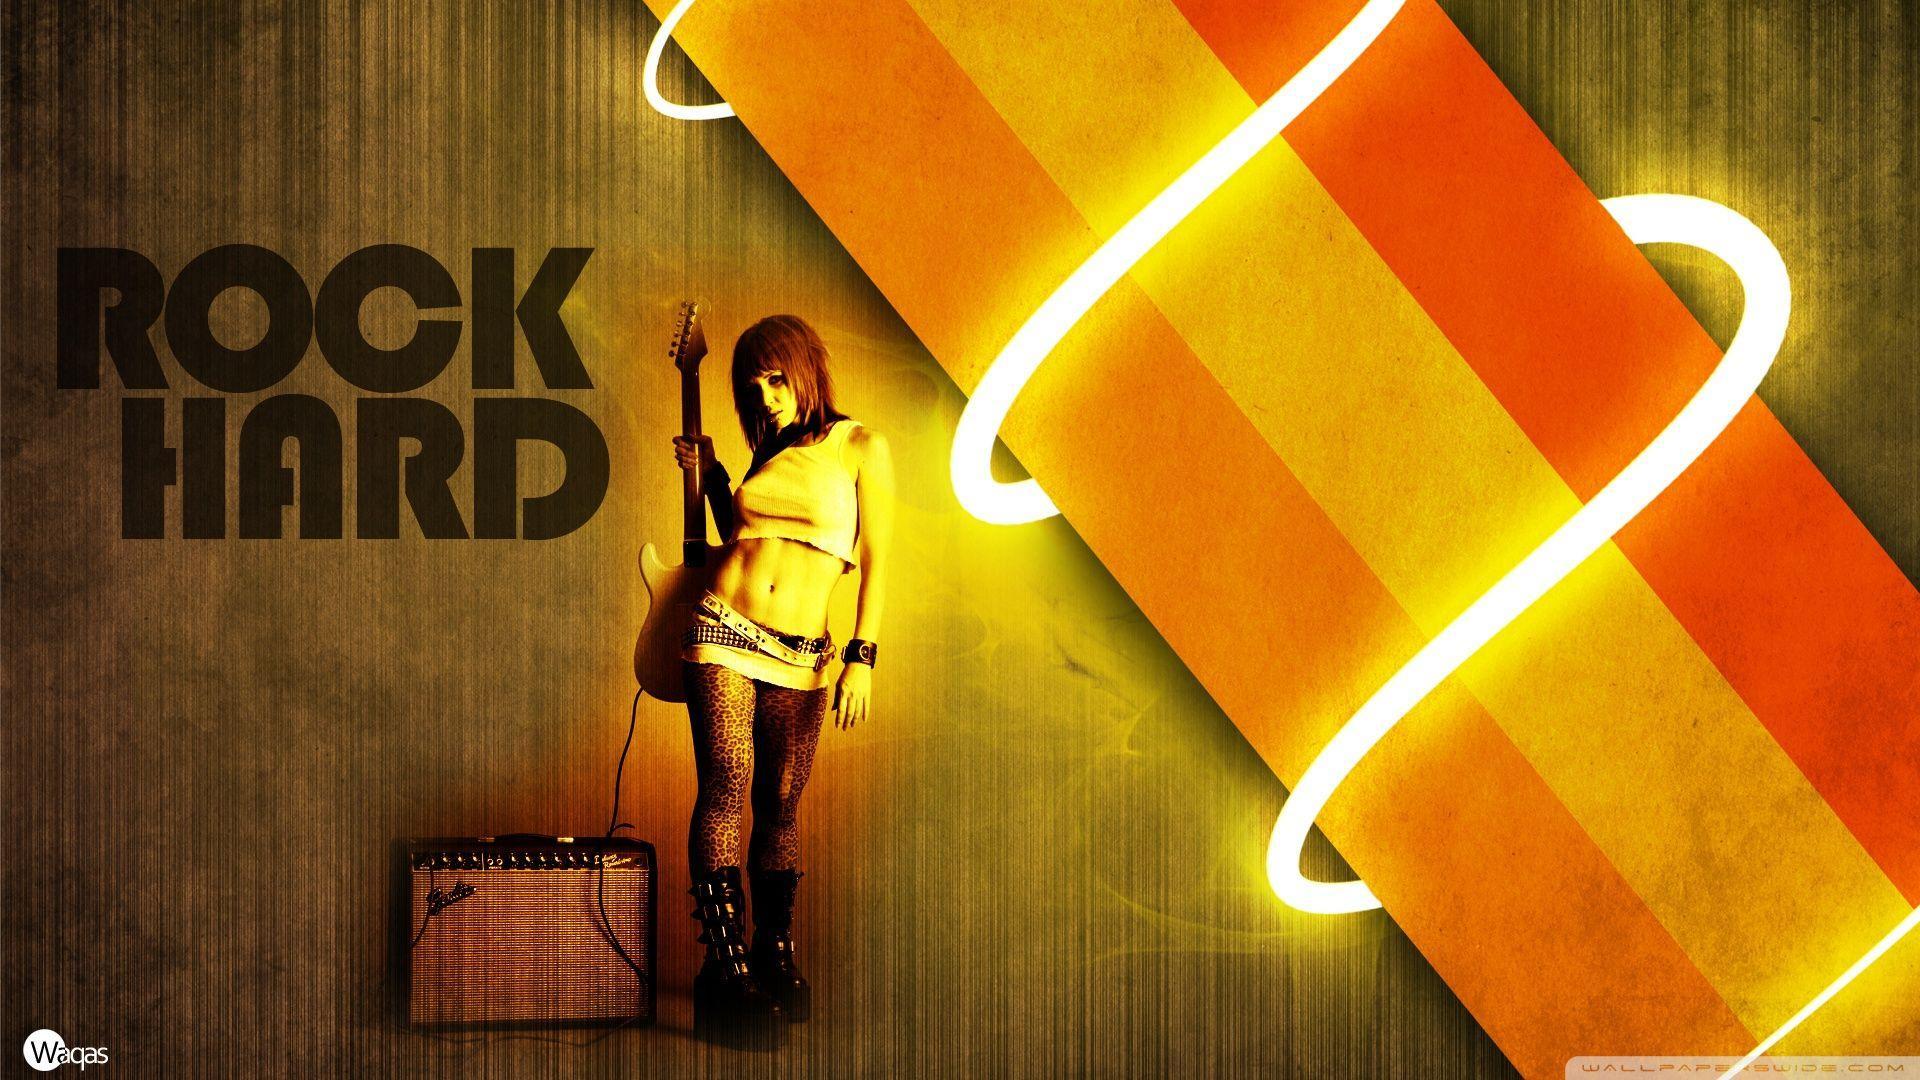 Rock Hard HD desktop wallpaper : High Definition : Fullscreen : Mobile